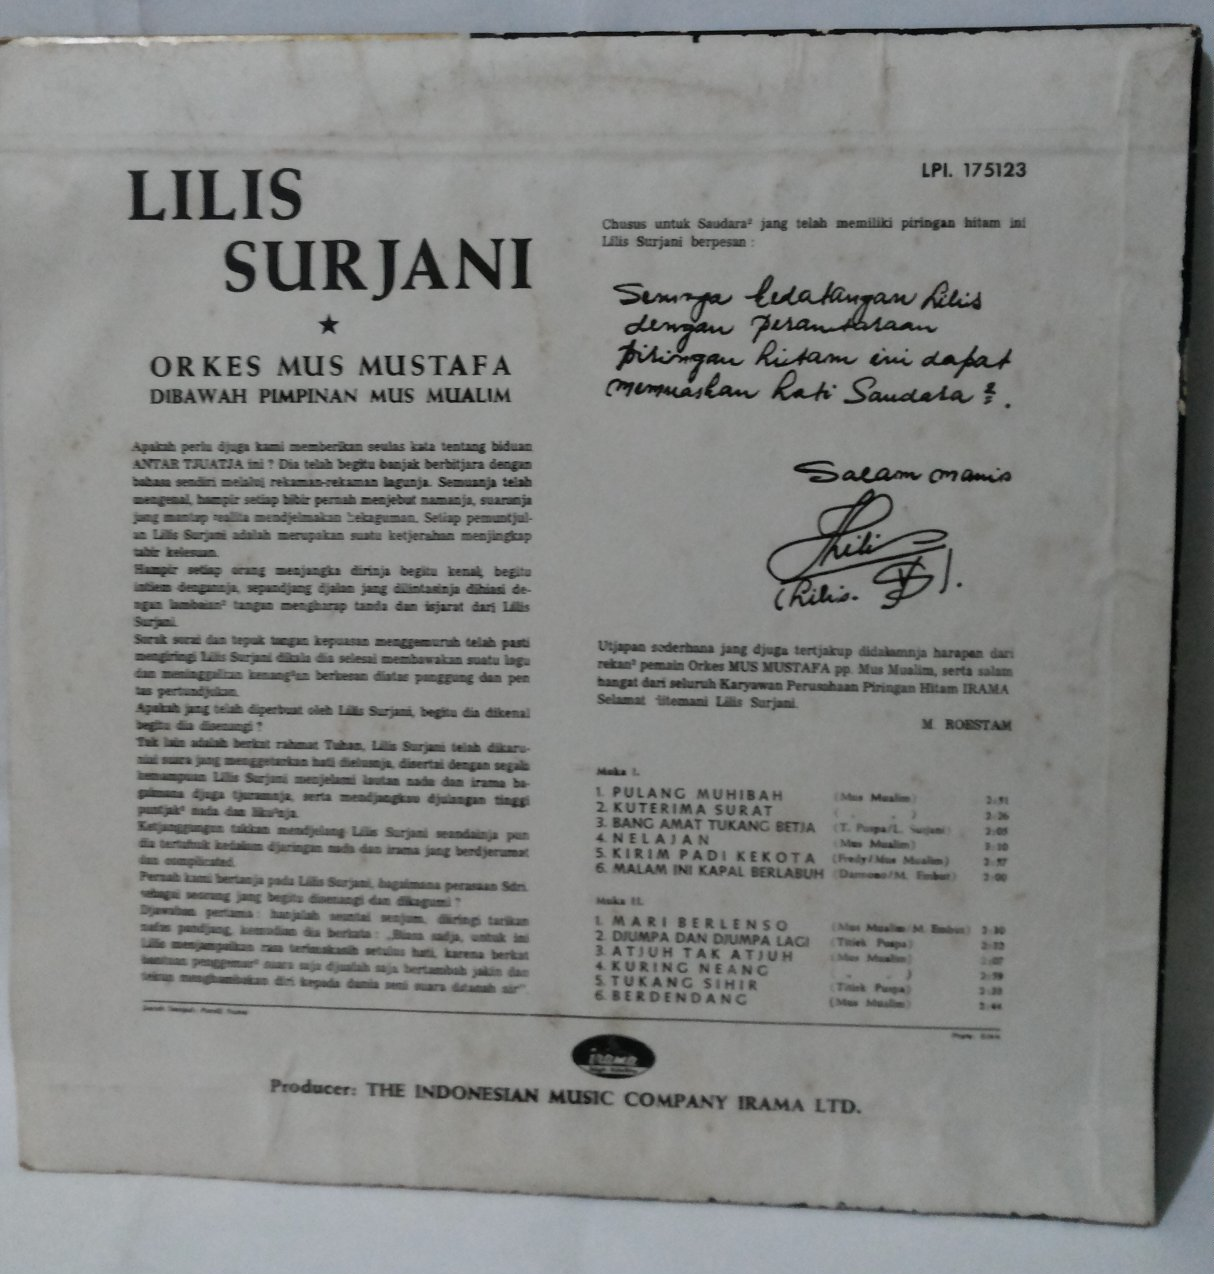 Lilis Surjani - Pulang Muhibah(2)